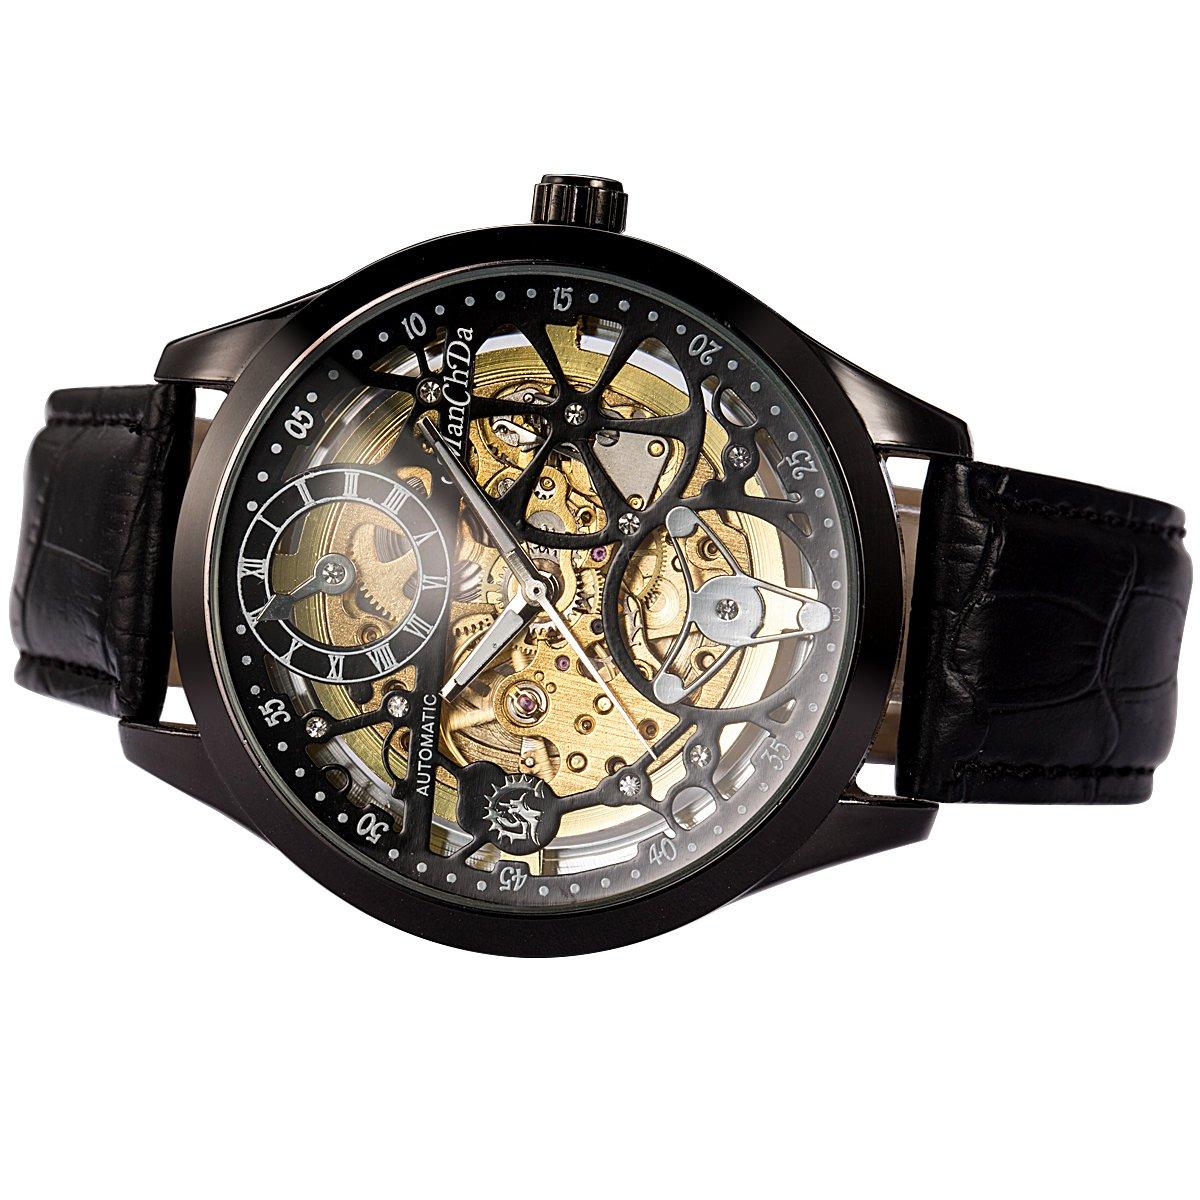 ManChDa Big Case 47MM XL Automatic Mechanical Crystal Black Leather Wrist Watch + Gift Box by ManChDa (Image #2)